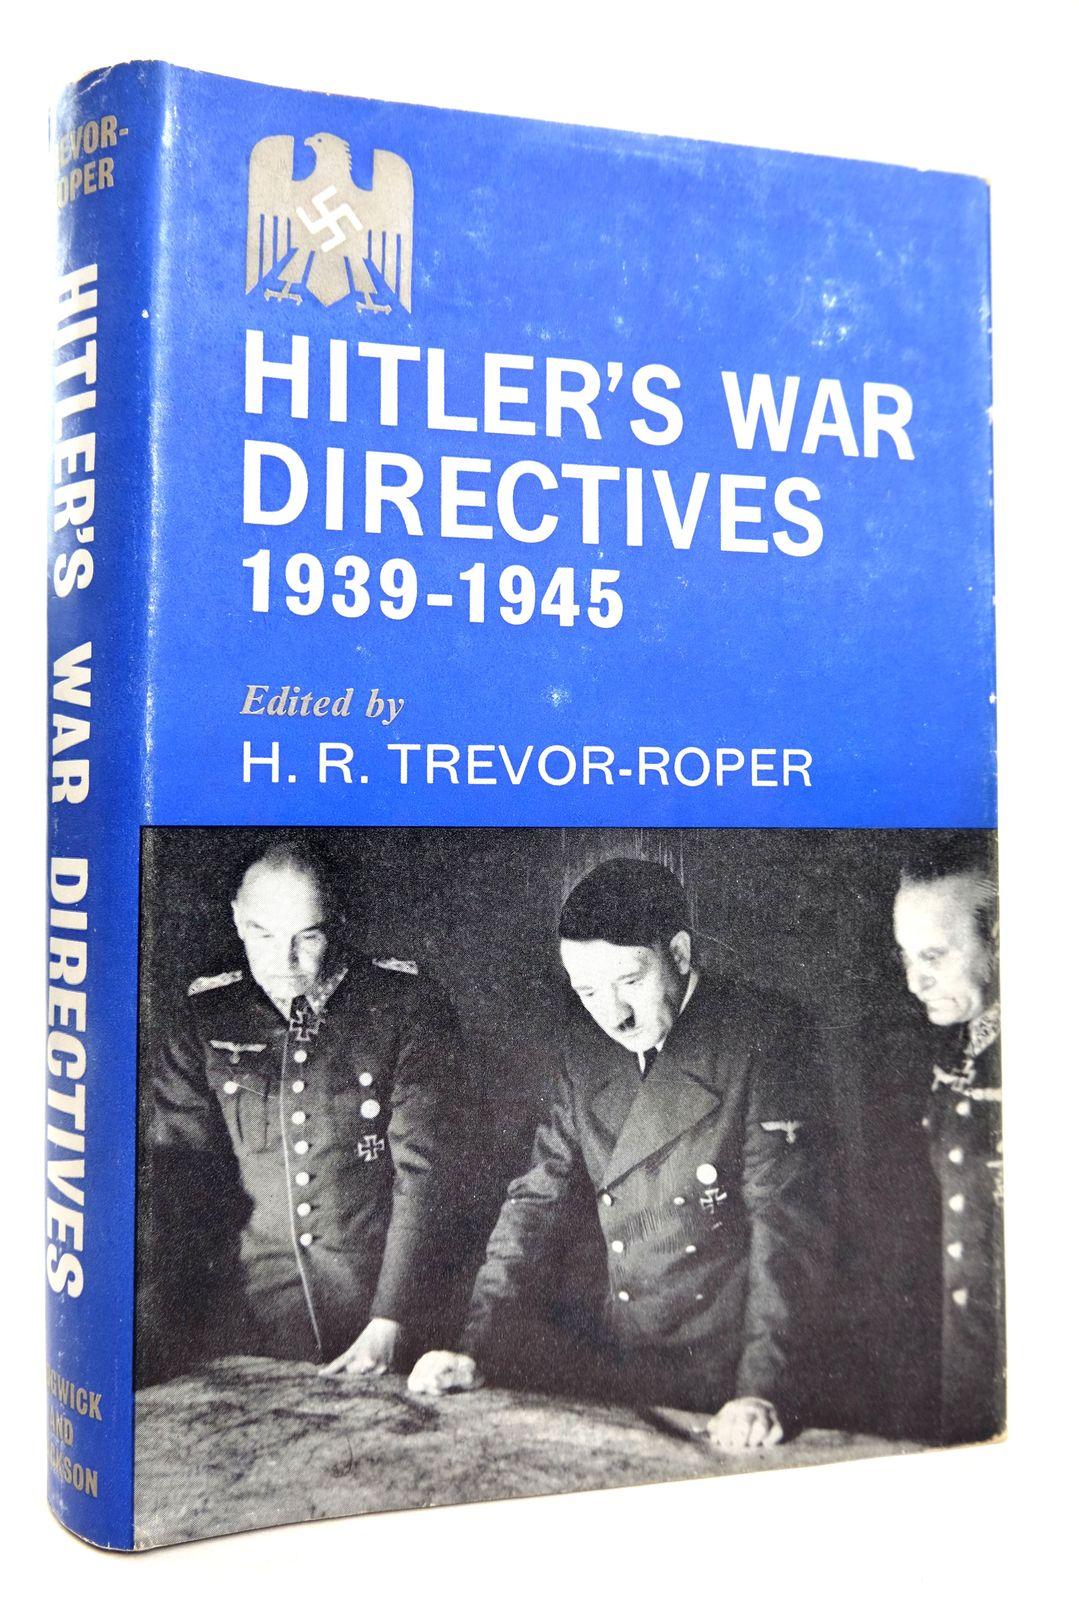 Photo of HITLER'S WAR DIRECTIVES 1939-1945- Stock Number: 1818892